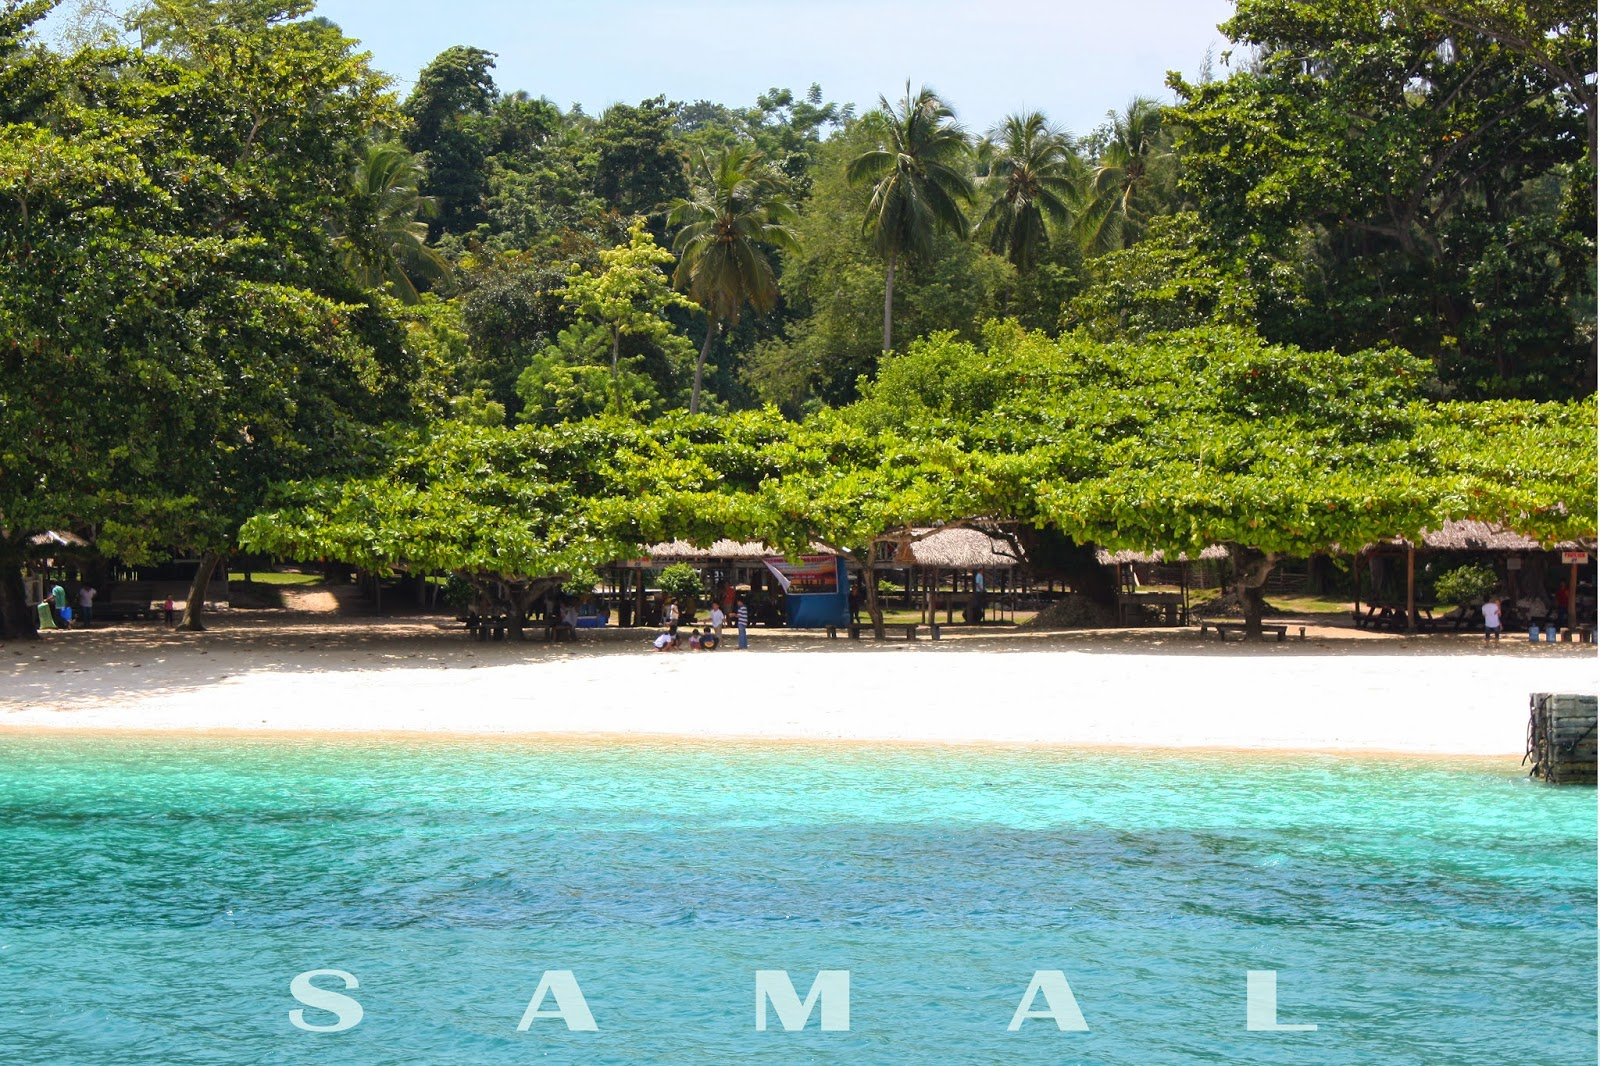 Isla Reta Beach Resort in the Island Garden of Samal